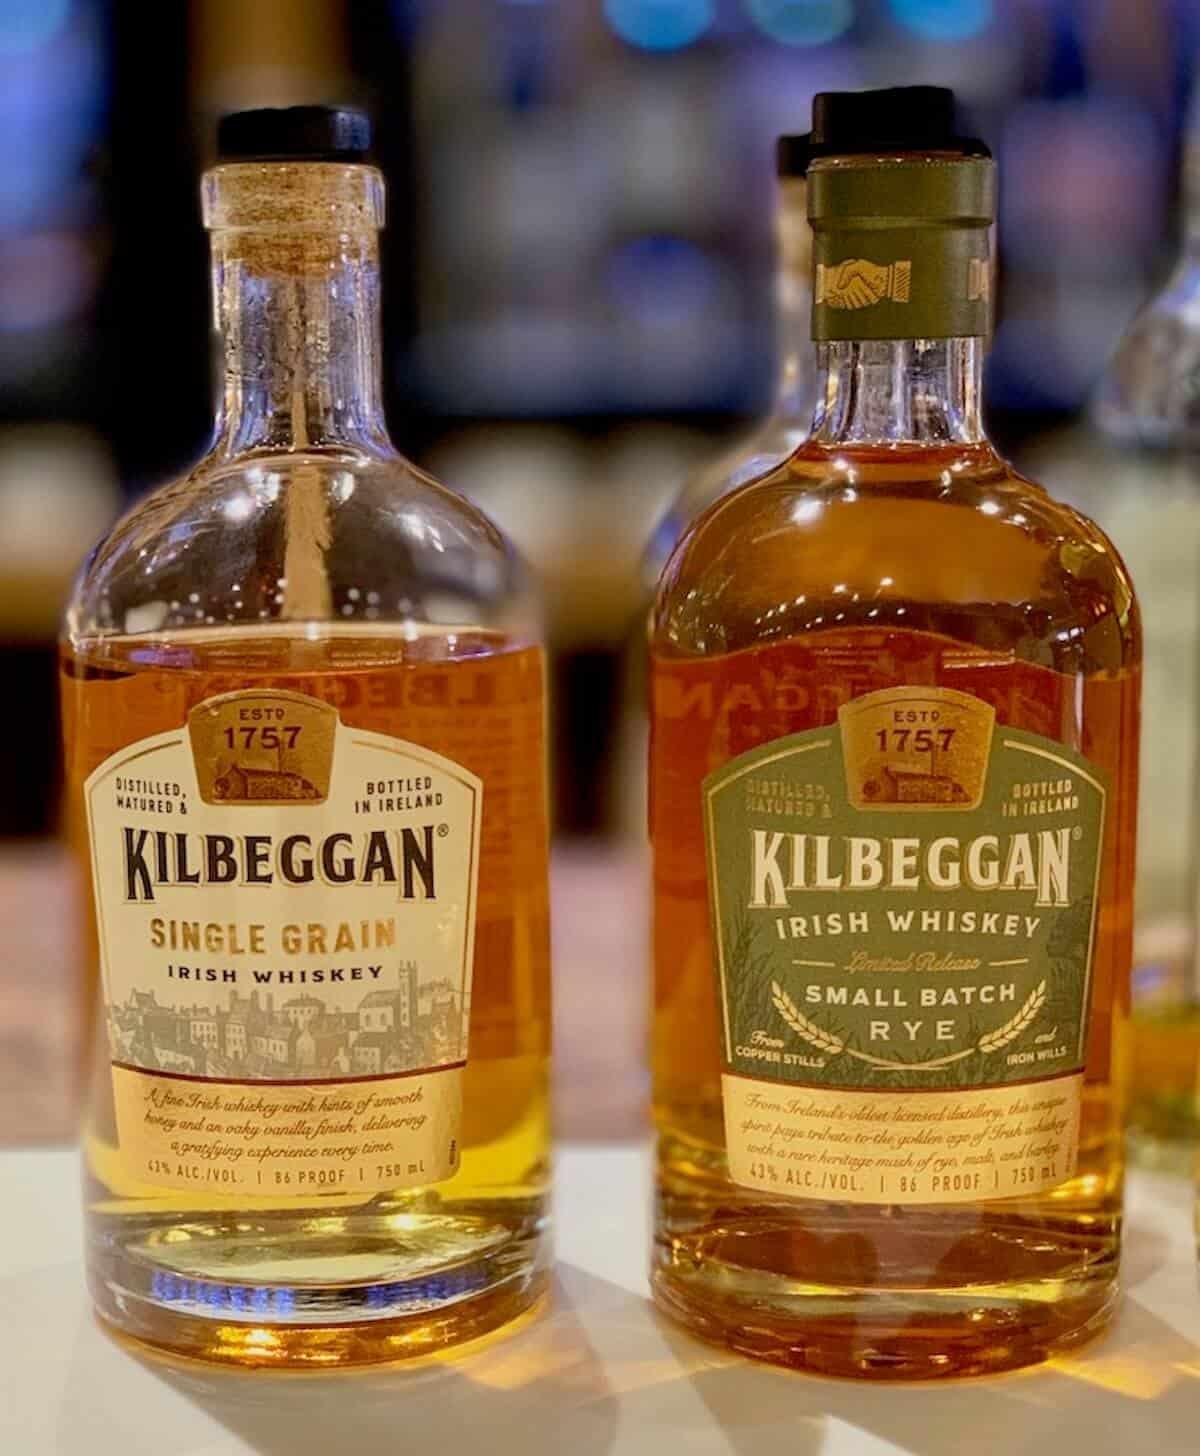 Kilbeggan Irish Whiskey in bottles